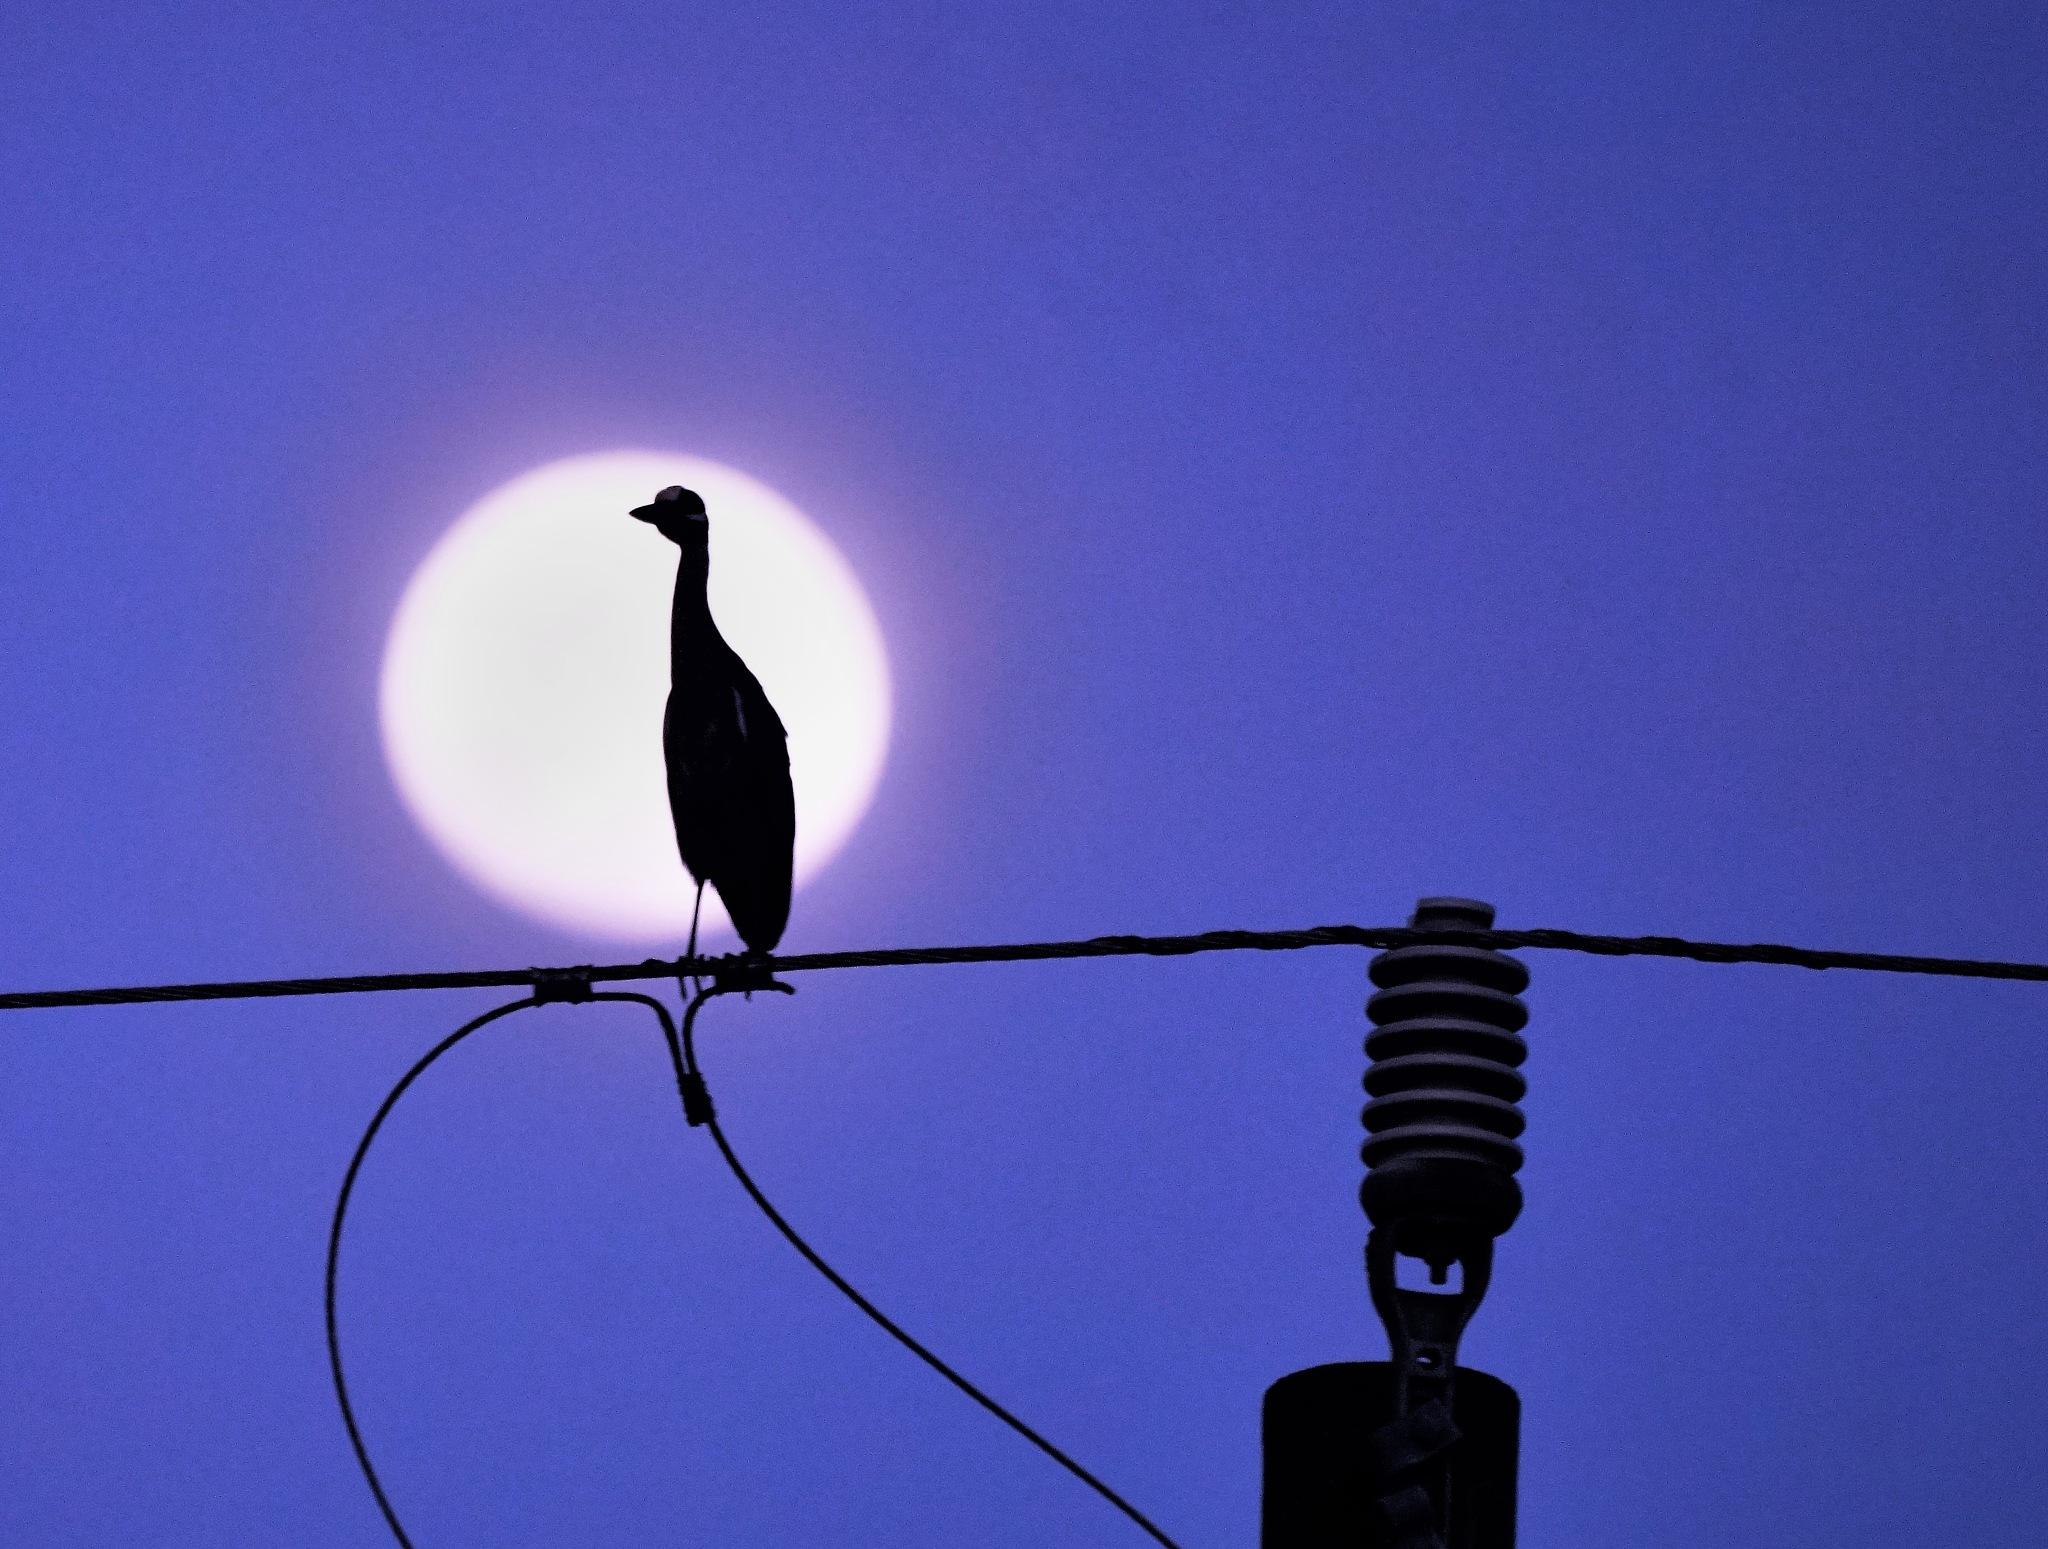 Yellow-crowned Night Heron II by MichaelDorsey